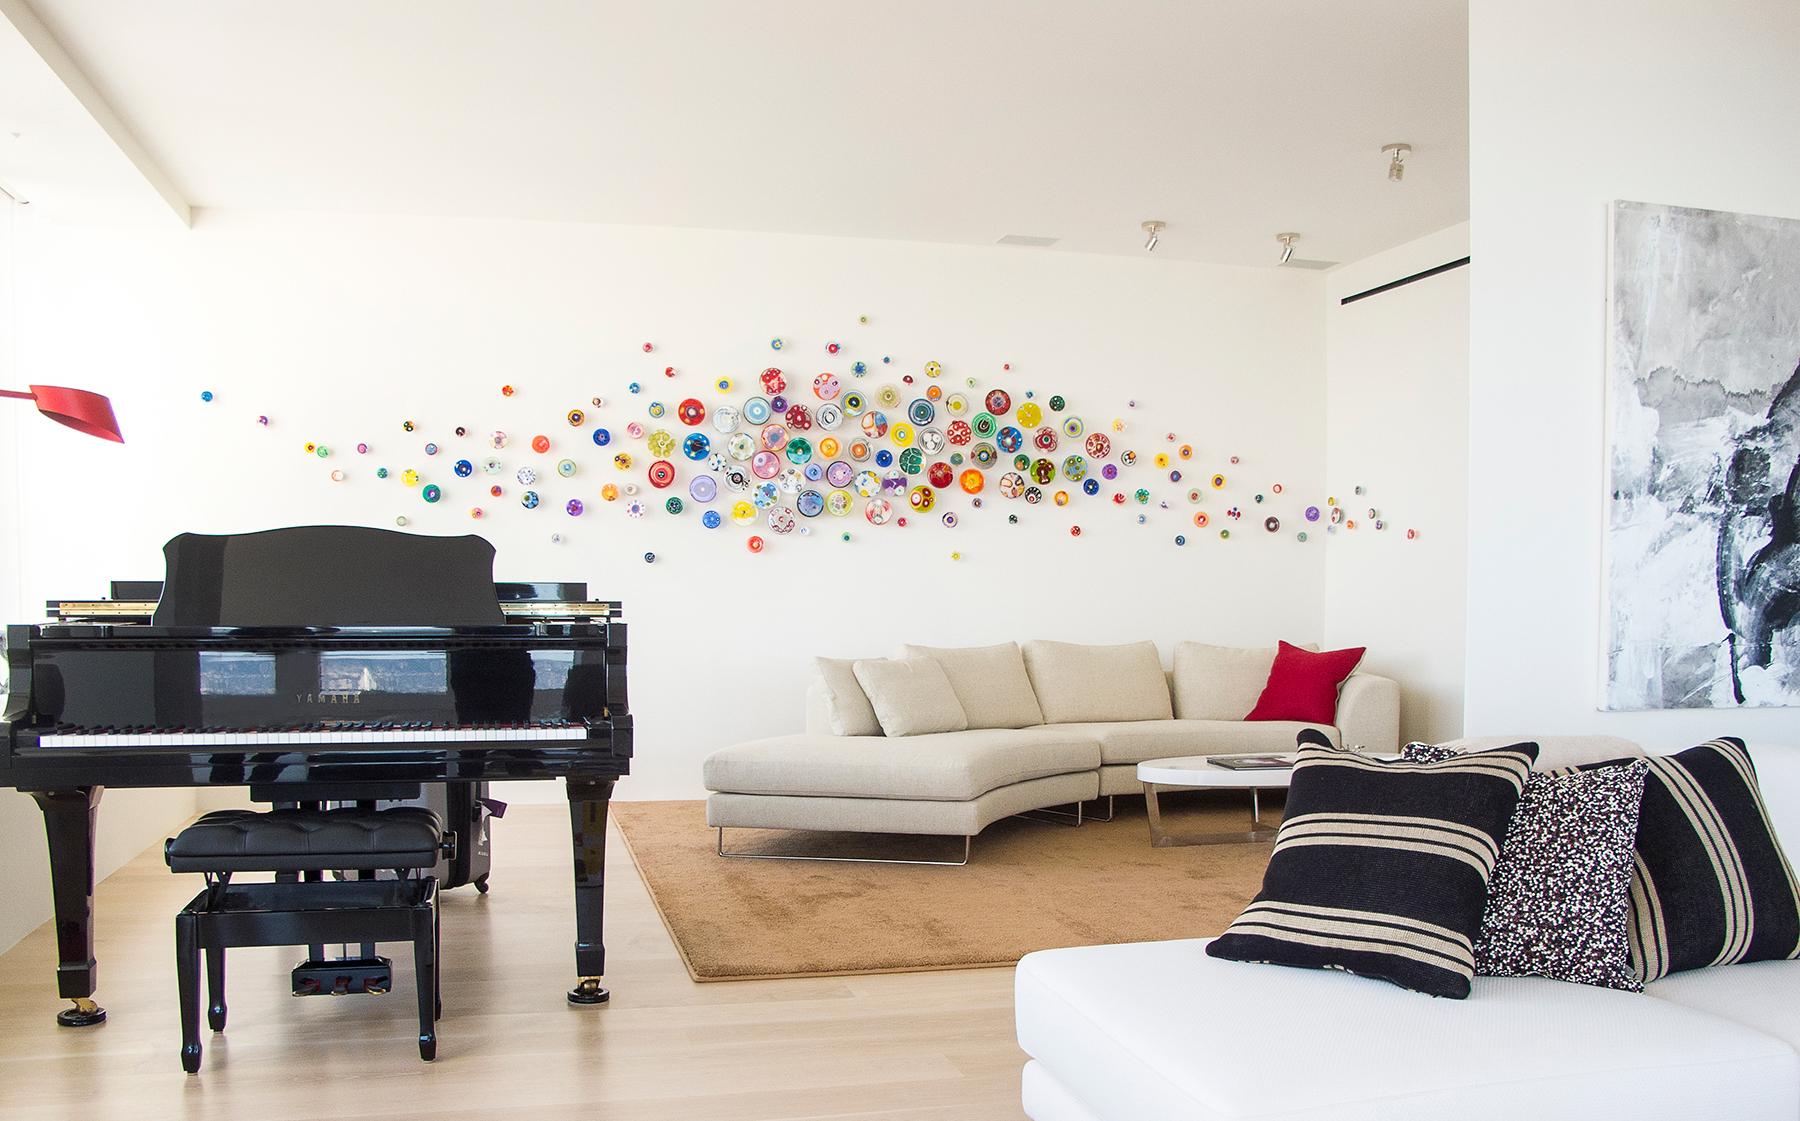 150 piece multicolor installation at the Millennium Tower, San Francisco.